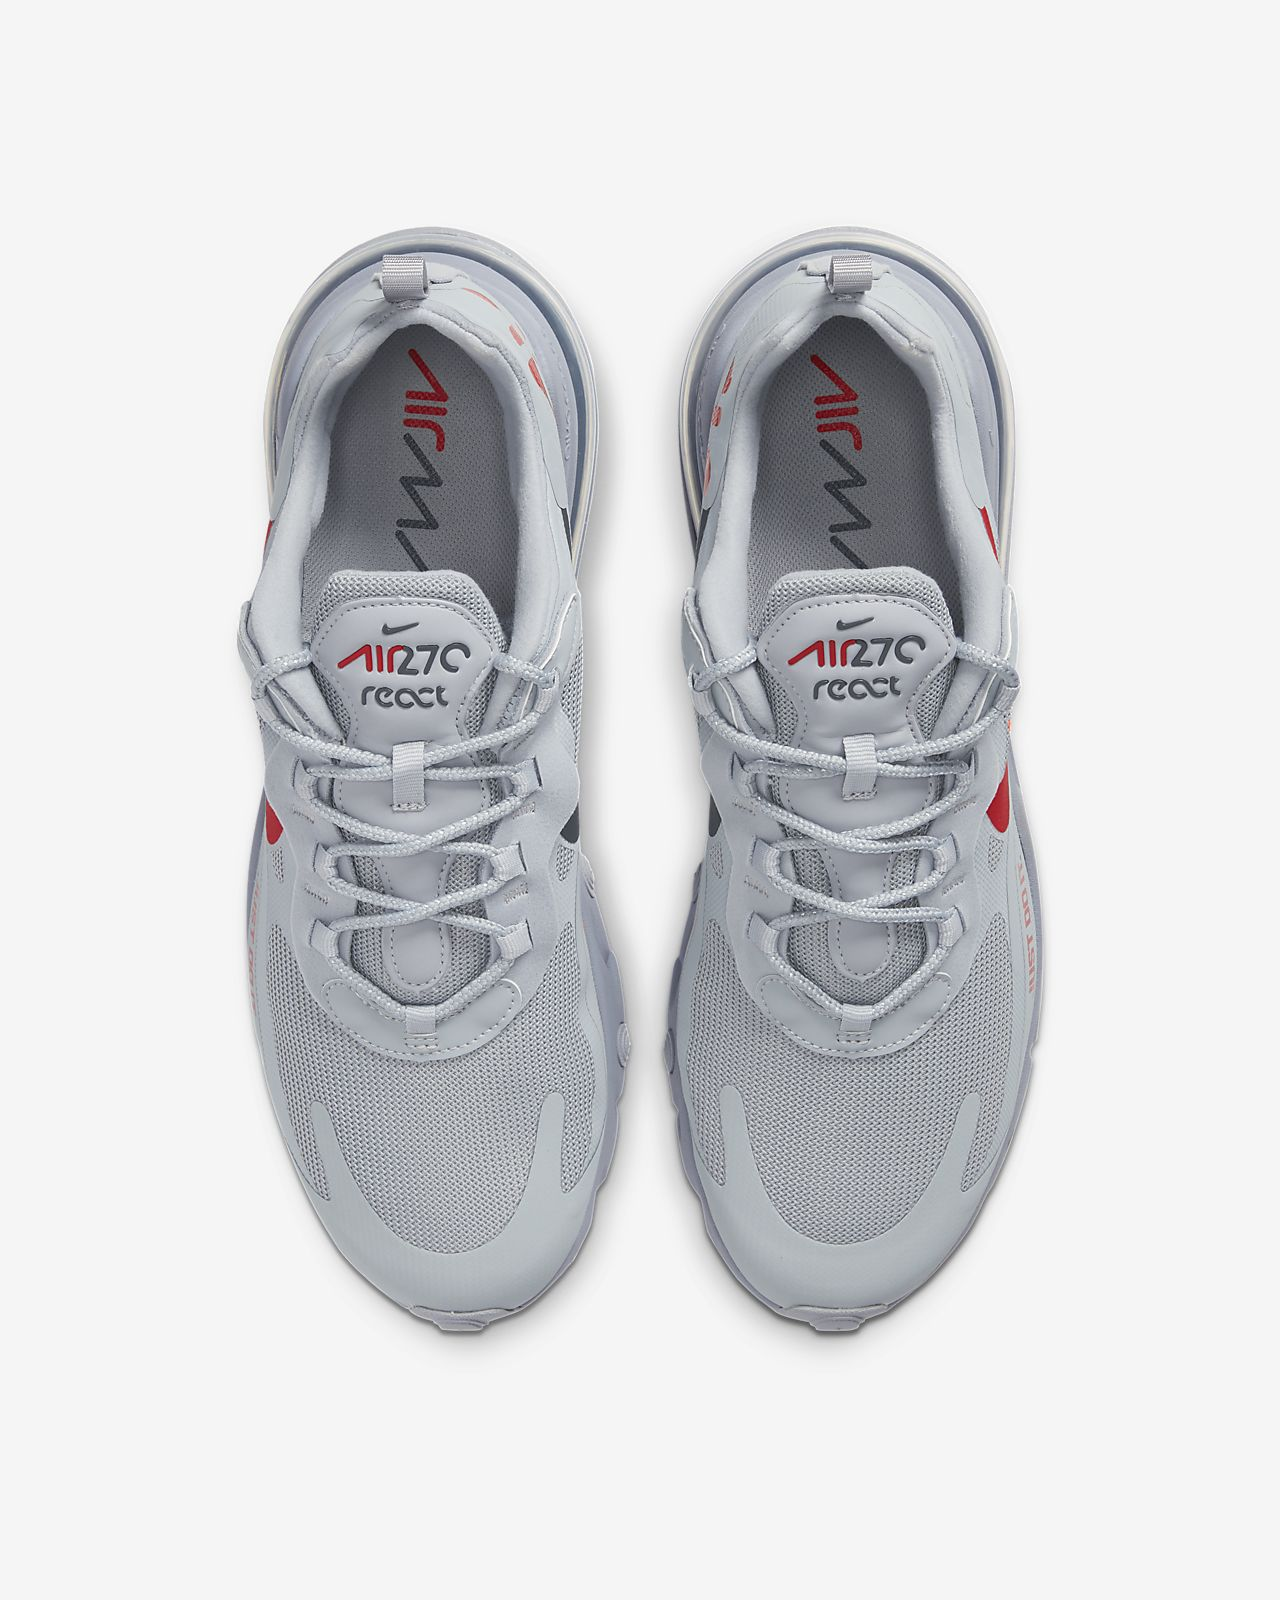 Nike Air Max 270 React wolf greyuniversity redanthracite